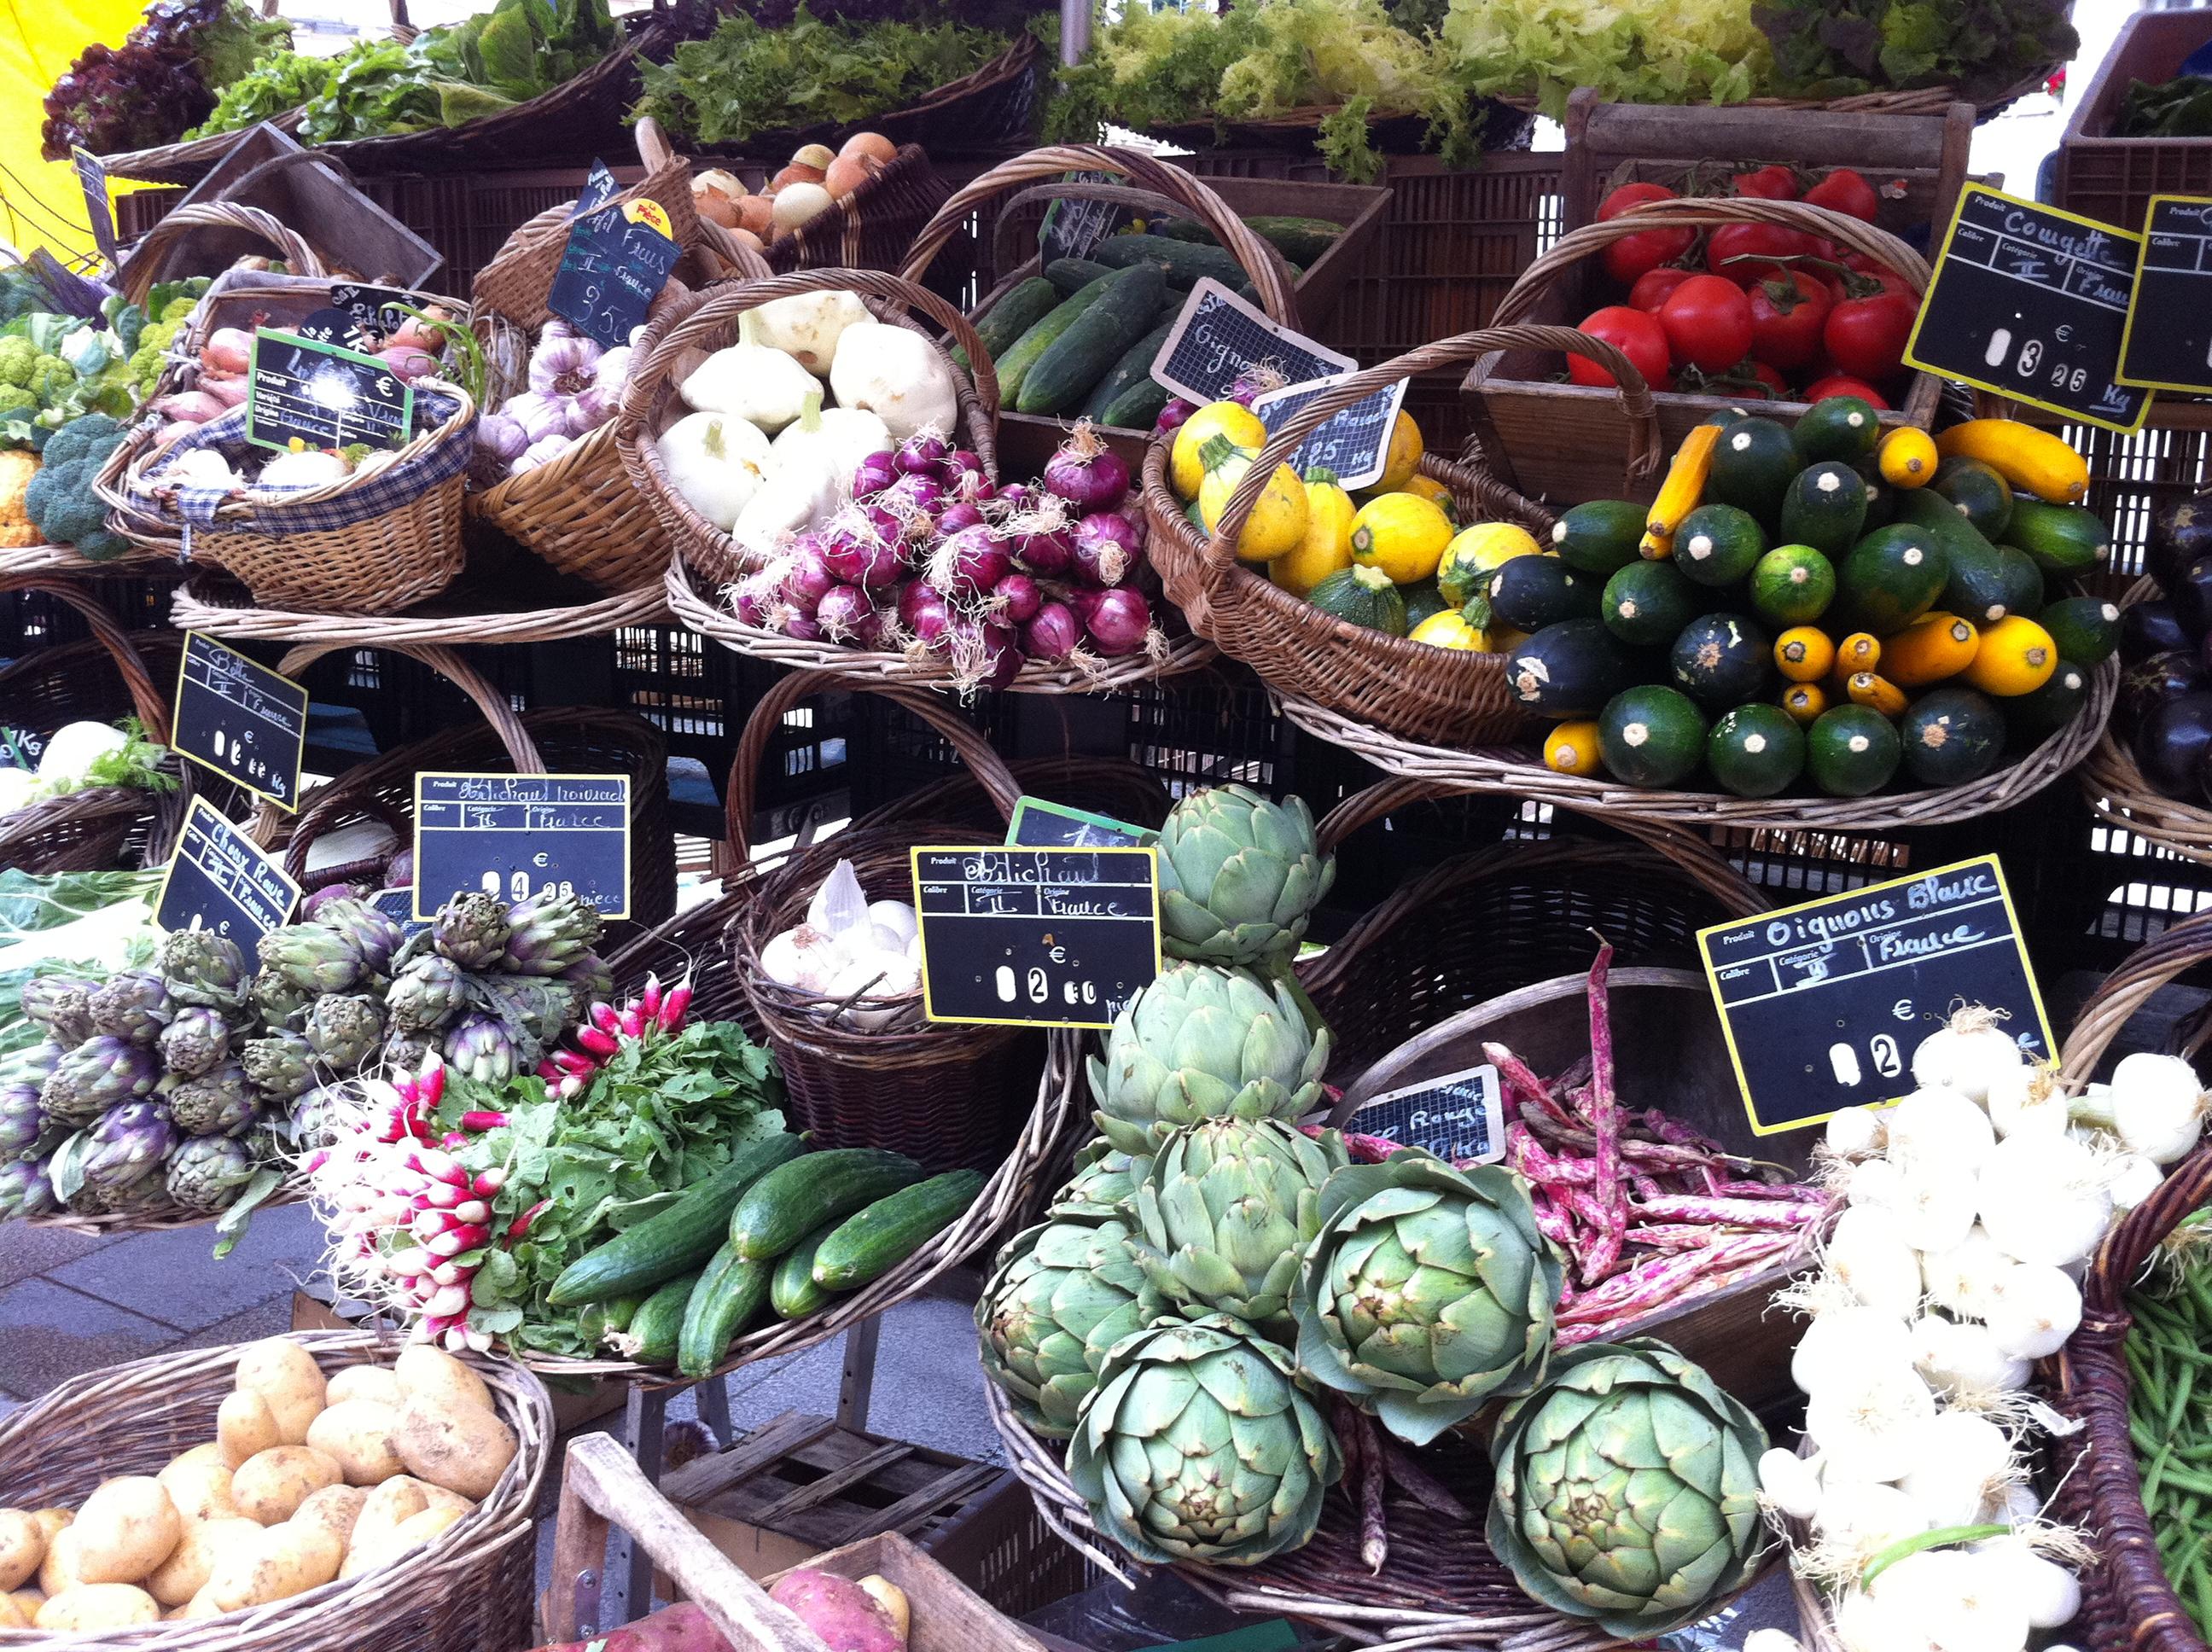 an artful farmer's market display